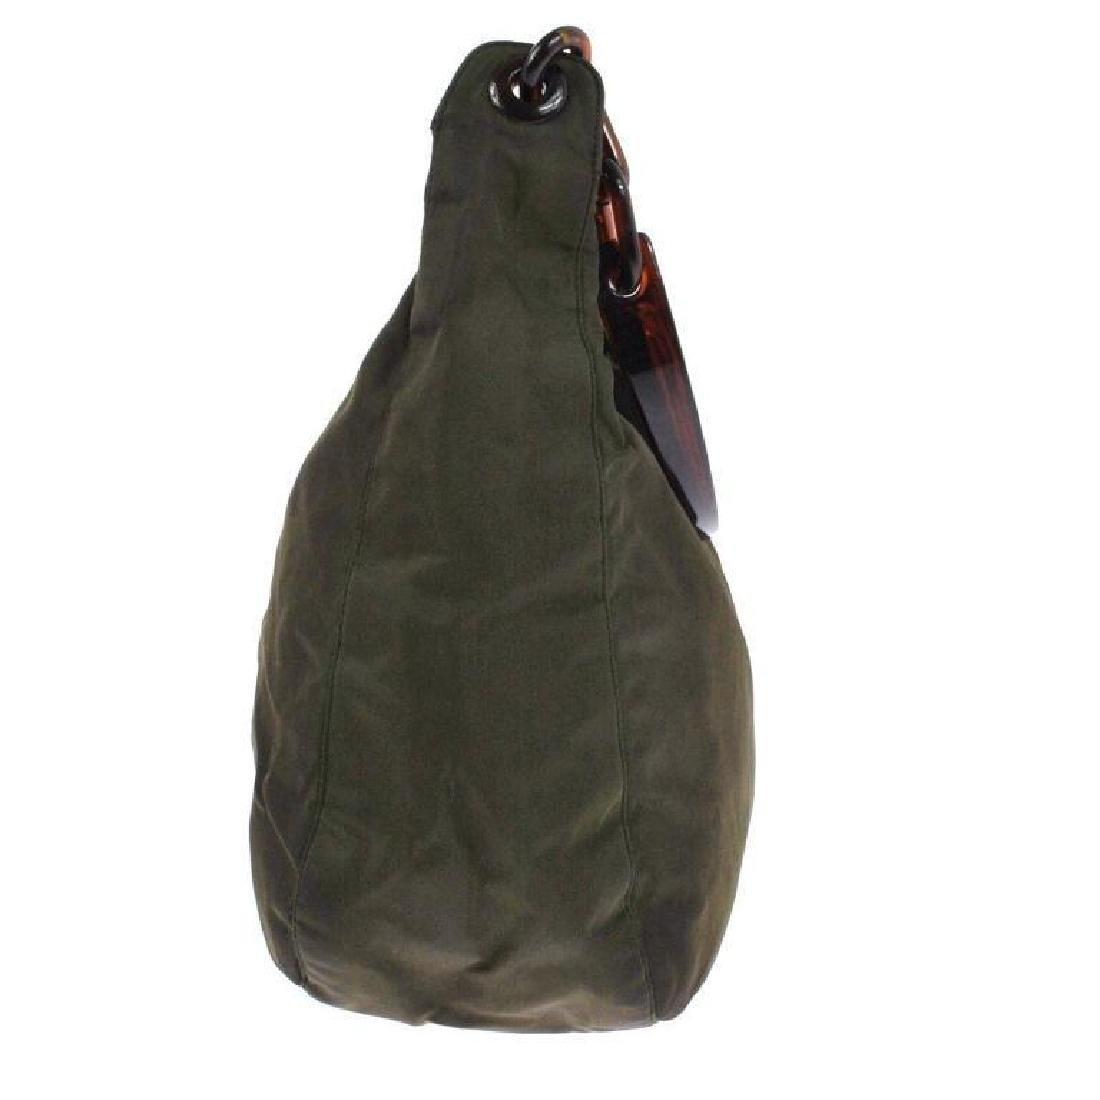 Authentic PRADA Nylon Olive Brown Purse Bag - 2